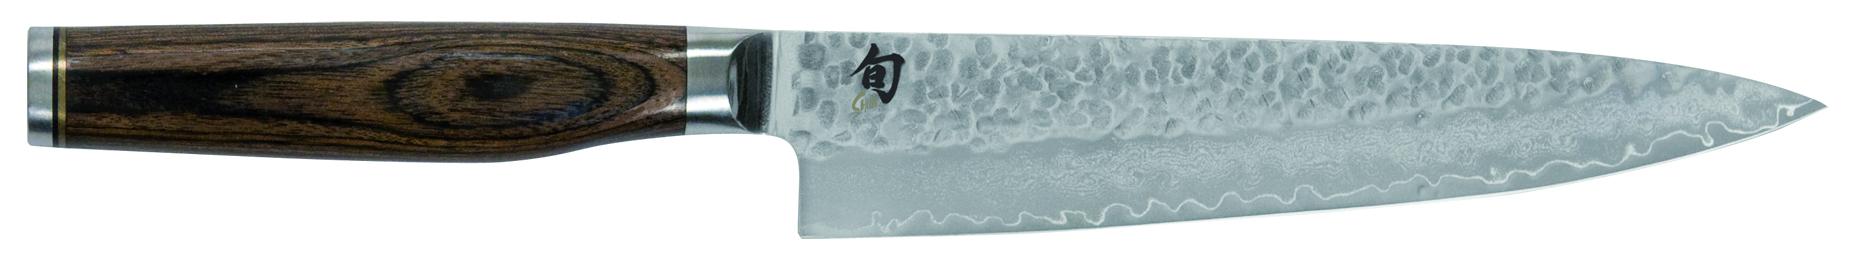 kai shun premier tim m lzer allzweckm 15 cm tdm 1701 ebay. Black Bedroom Furniture Sets. Home Design Ideas